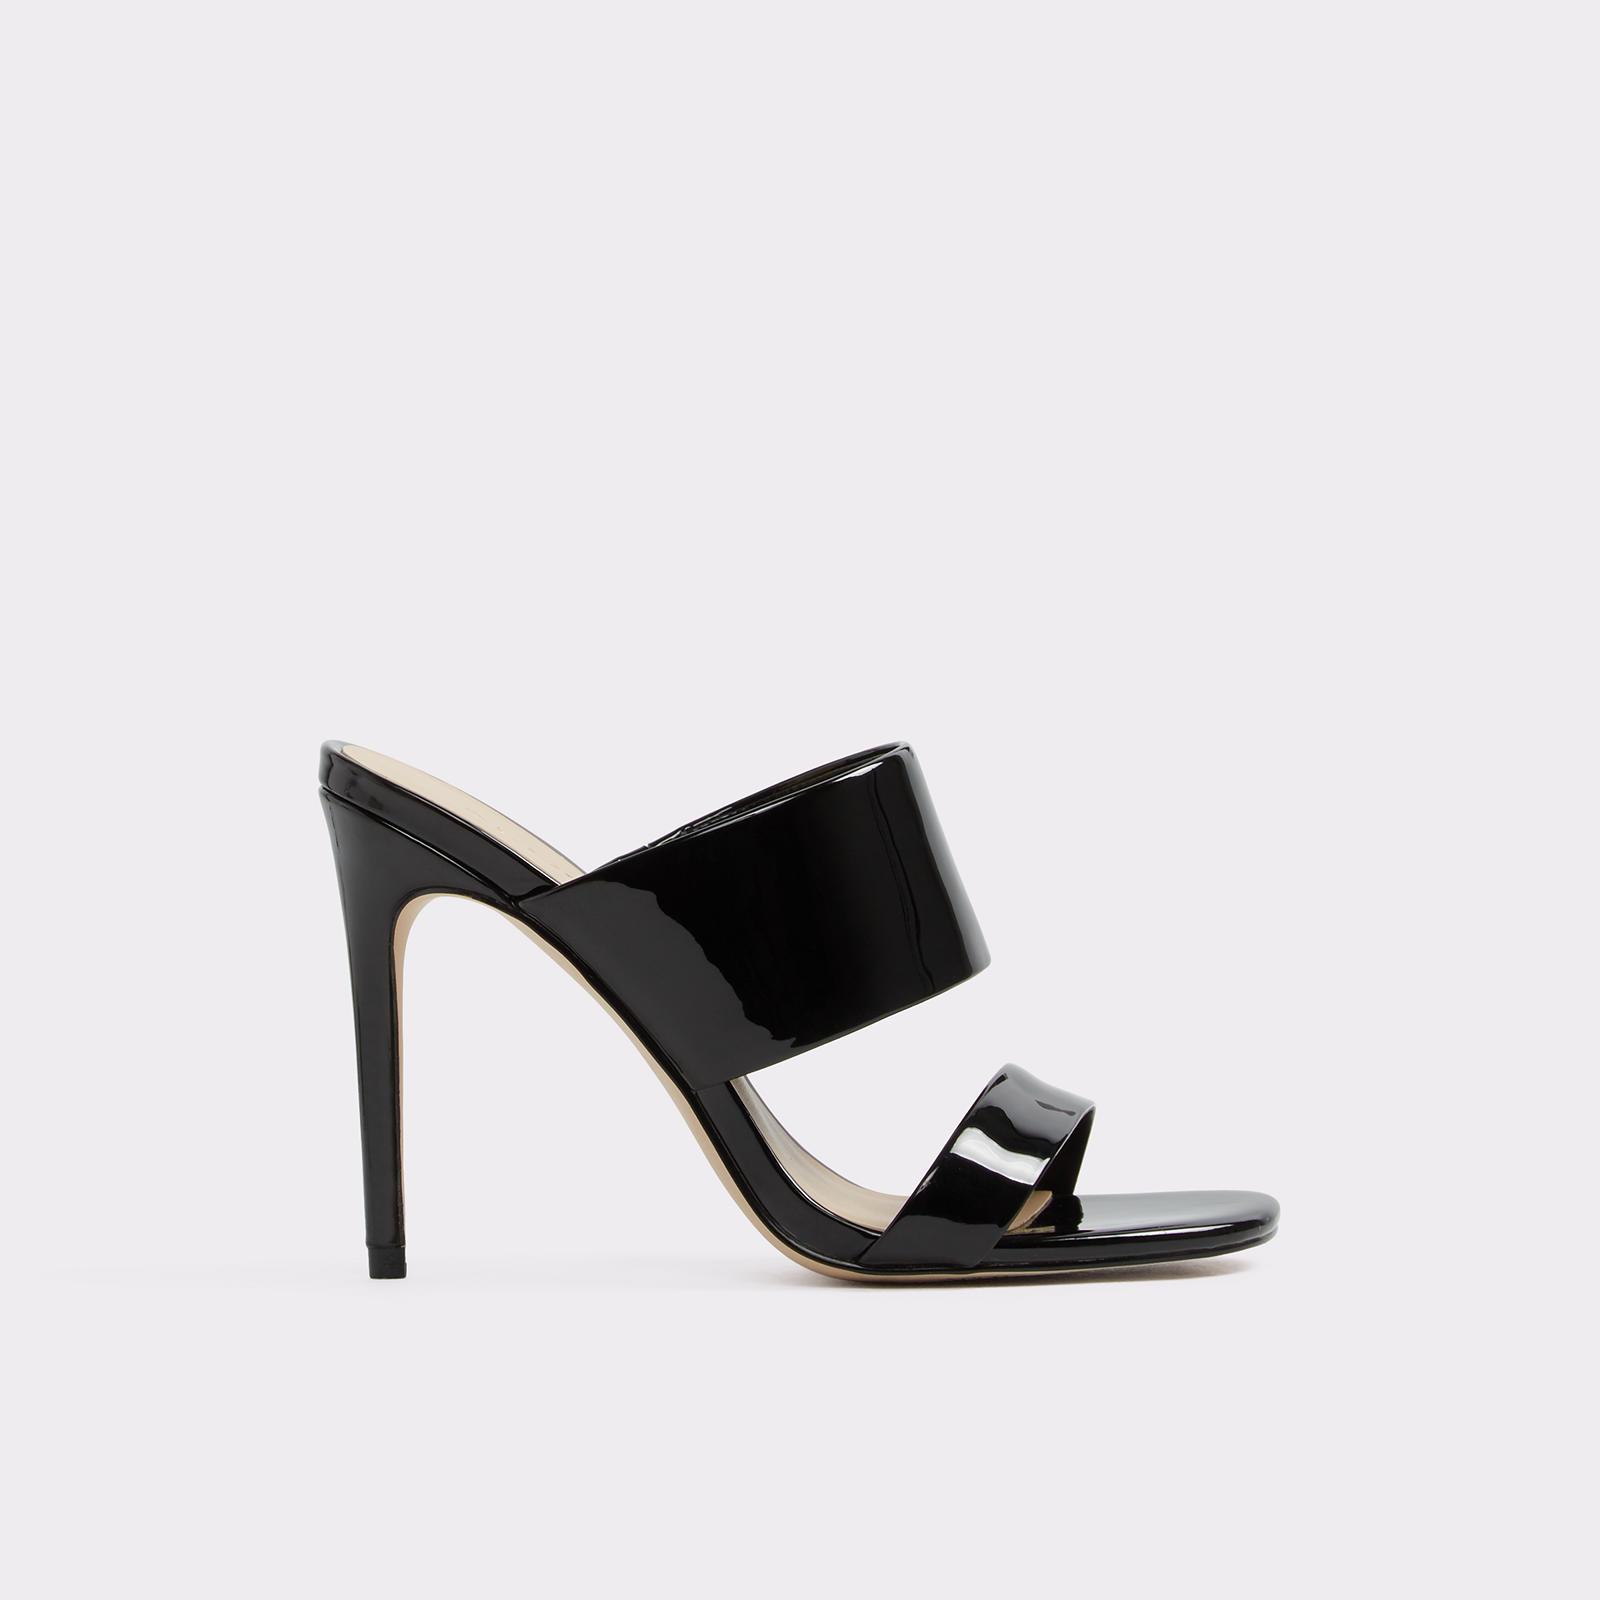 90ae9b949c19 Froema Black Patent Women s Open-toe heels